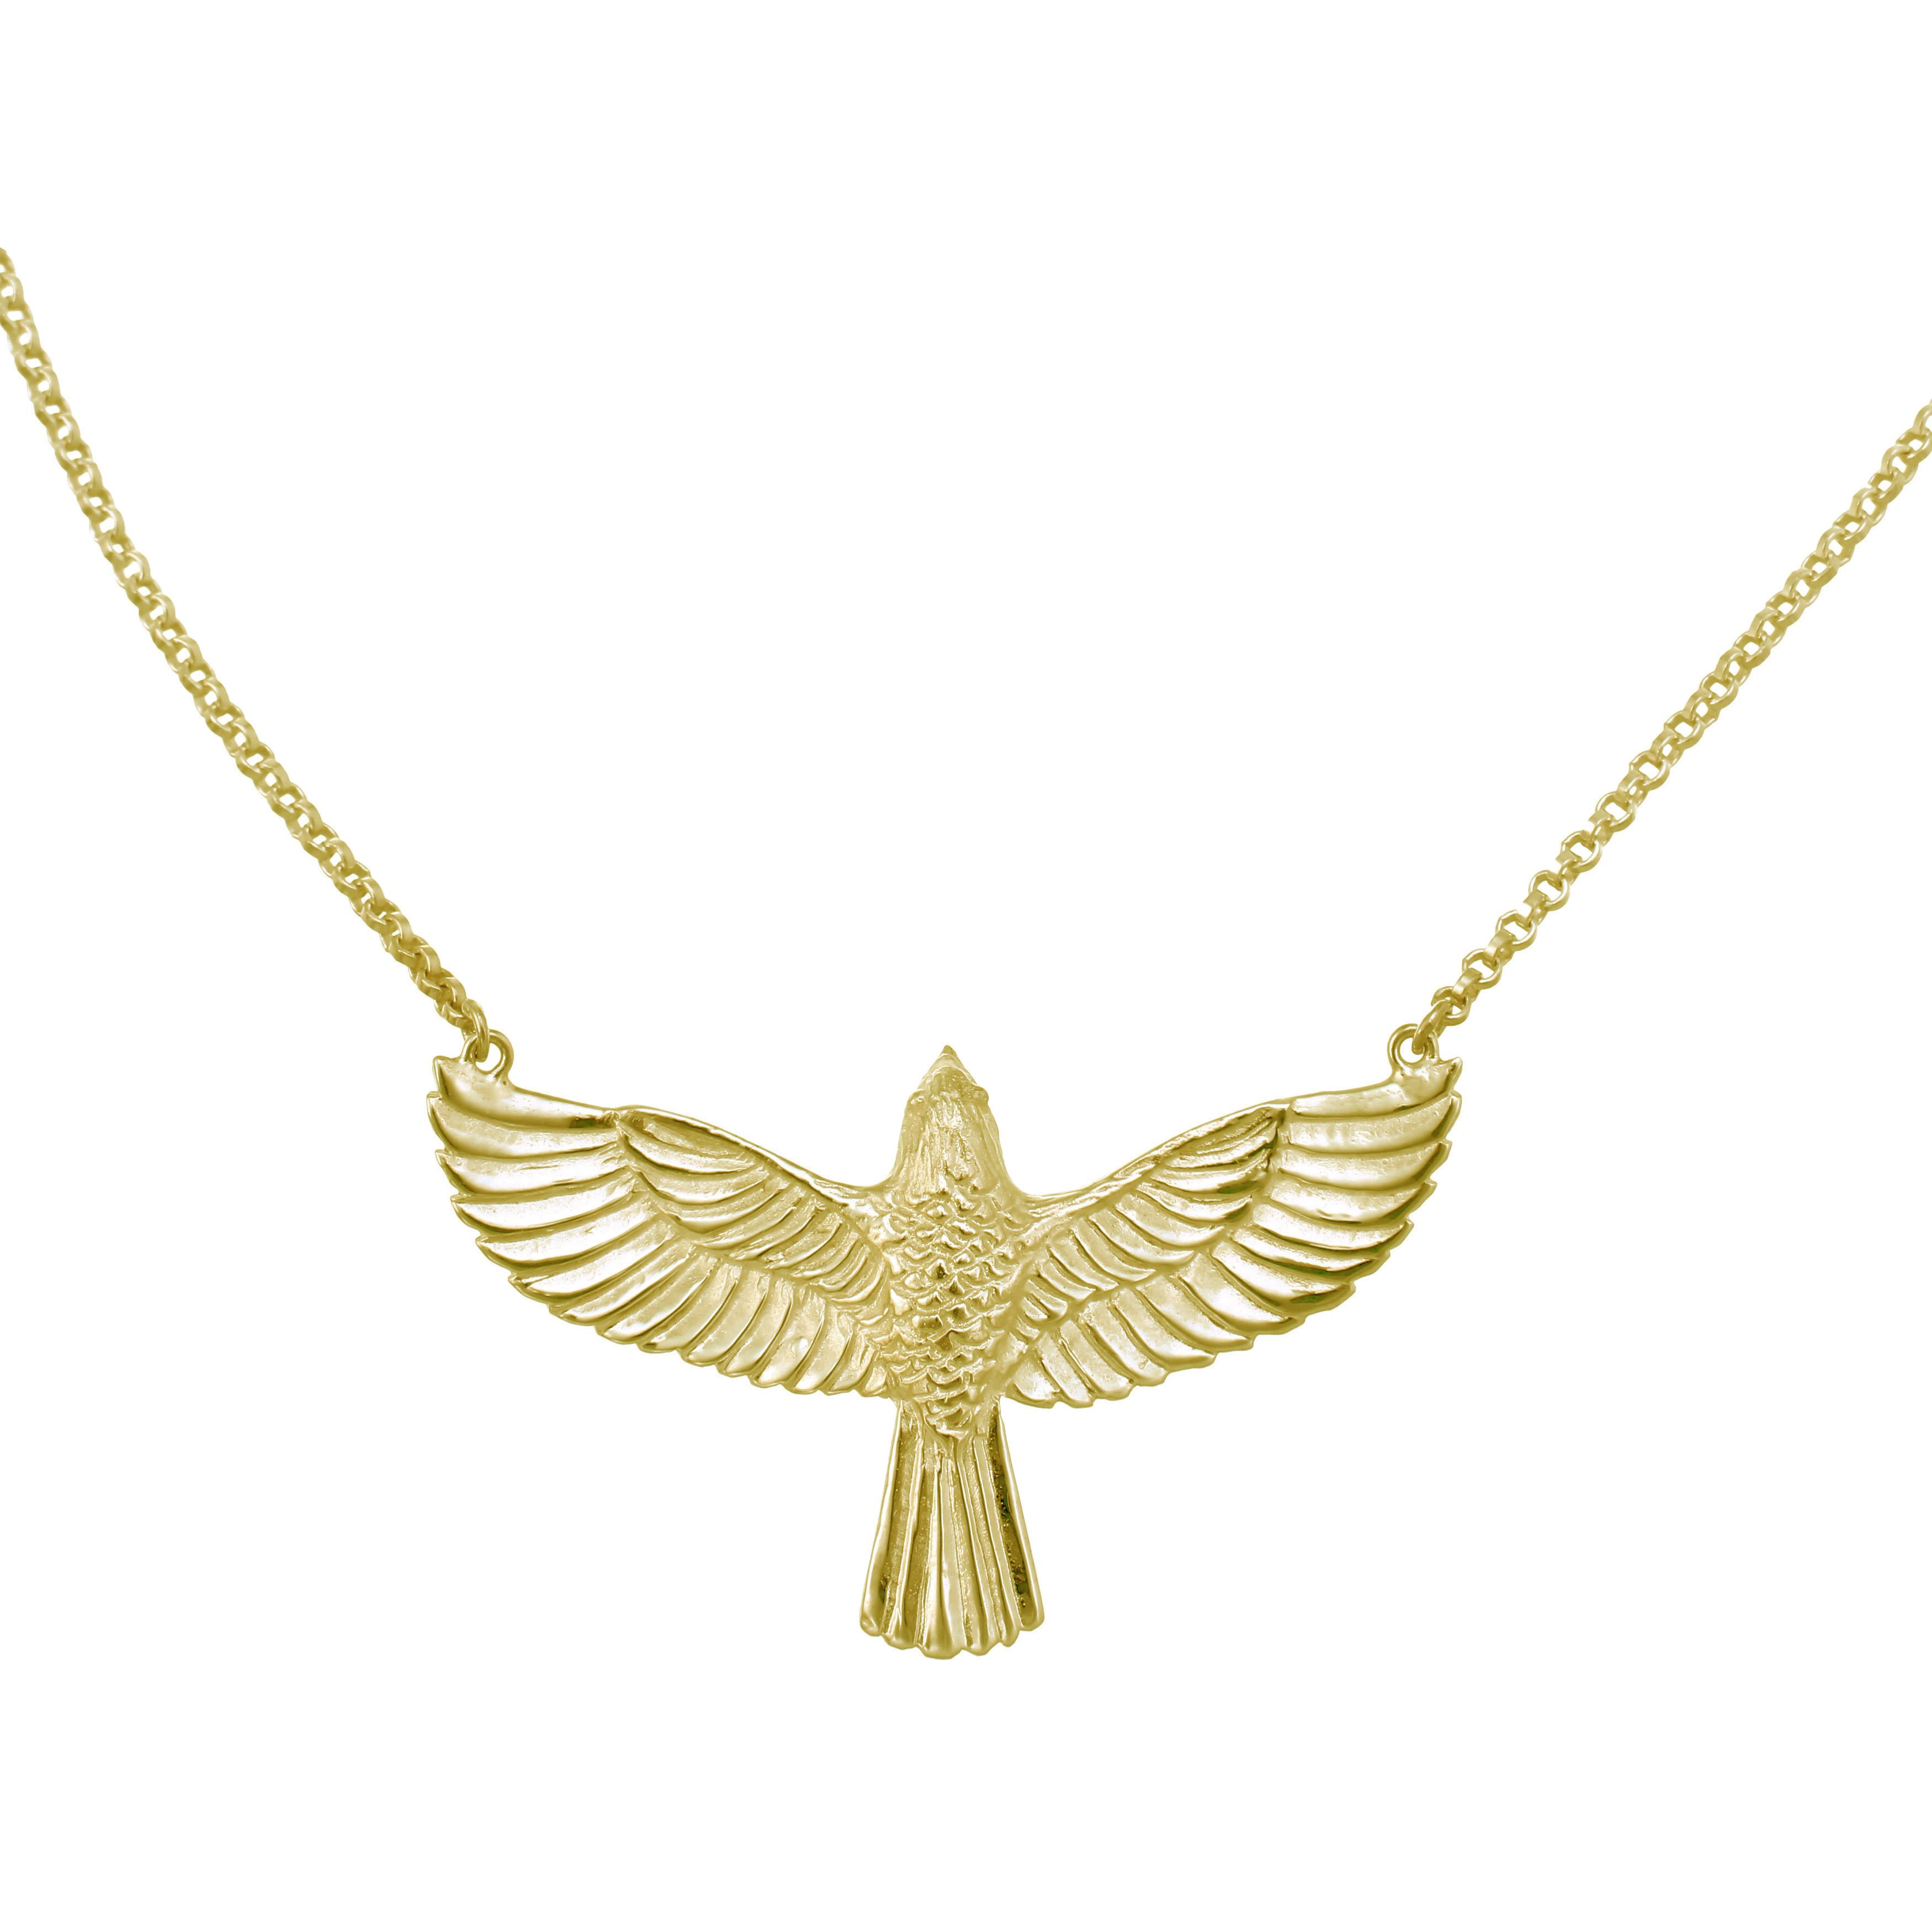 Falcon Necklace